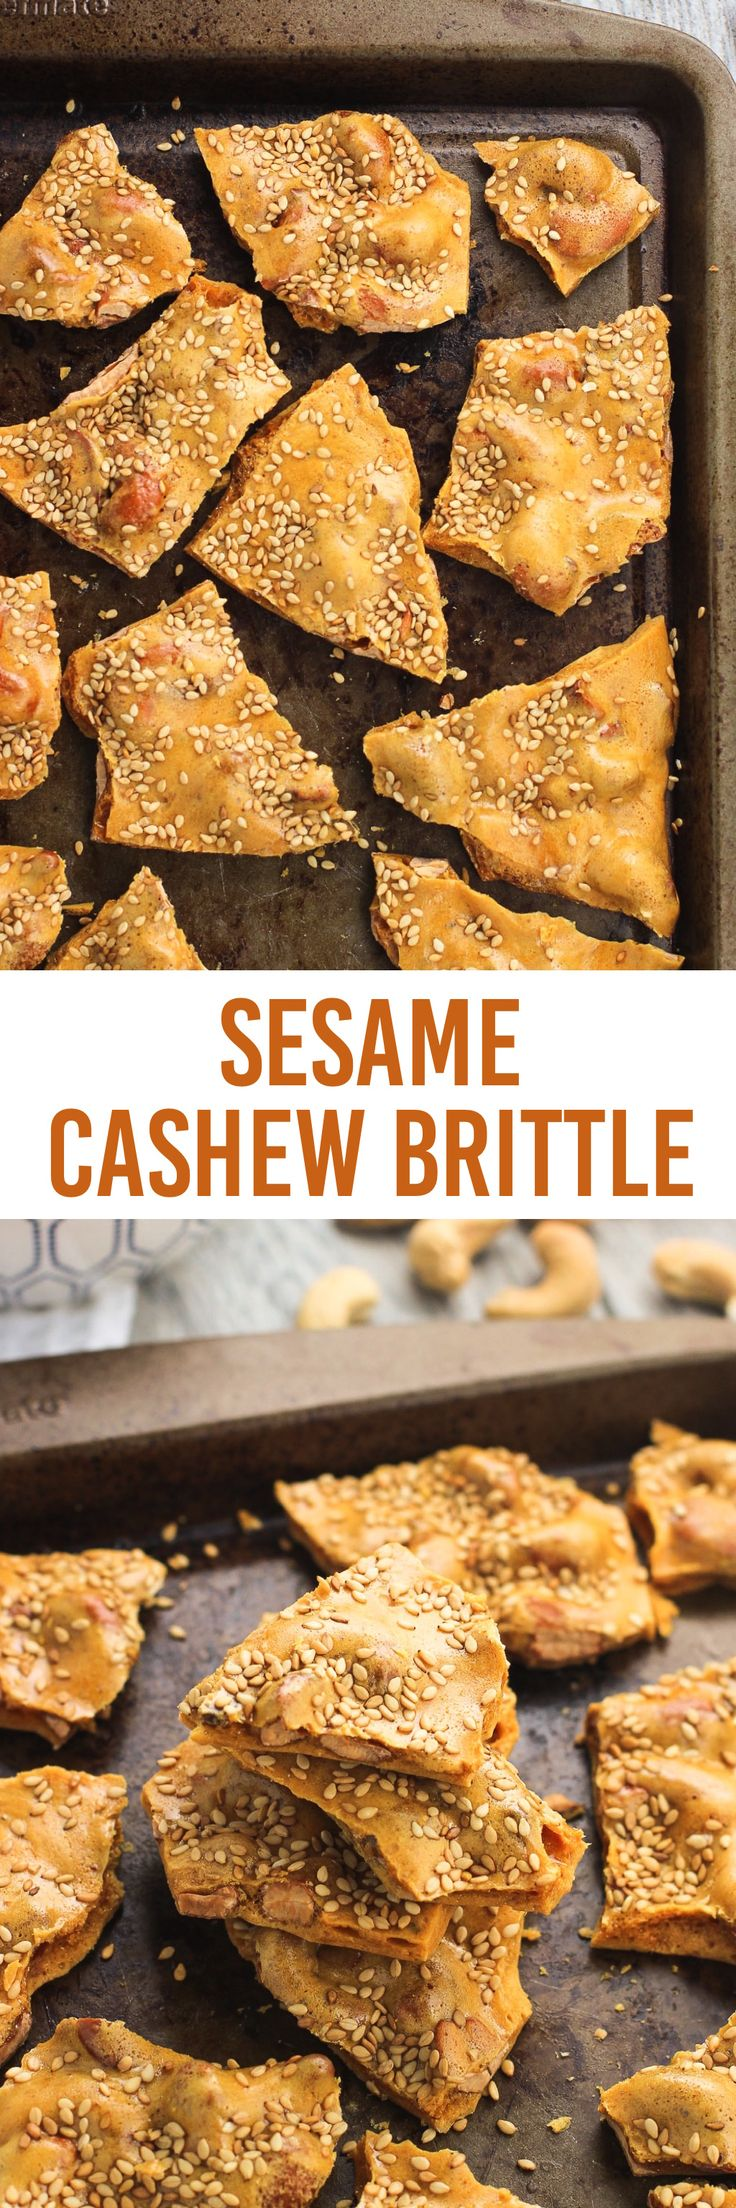 25+ best ideas about Cashew brittle on Pinterest | Candy ...